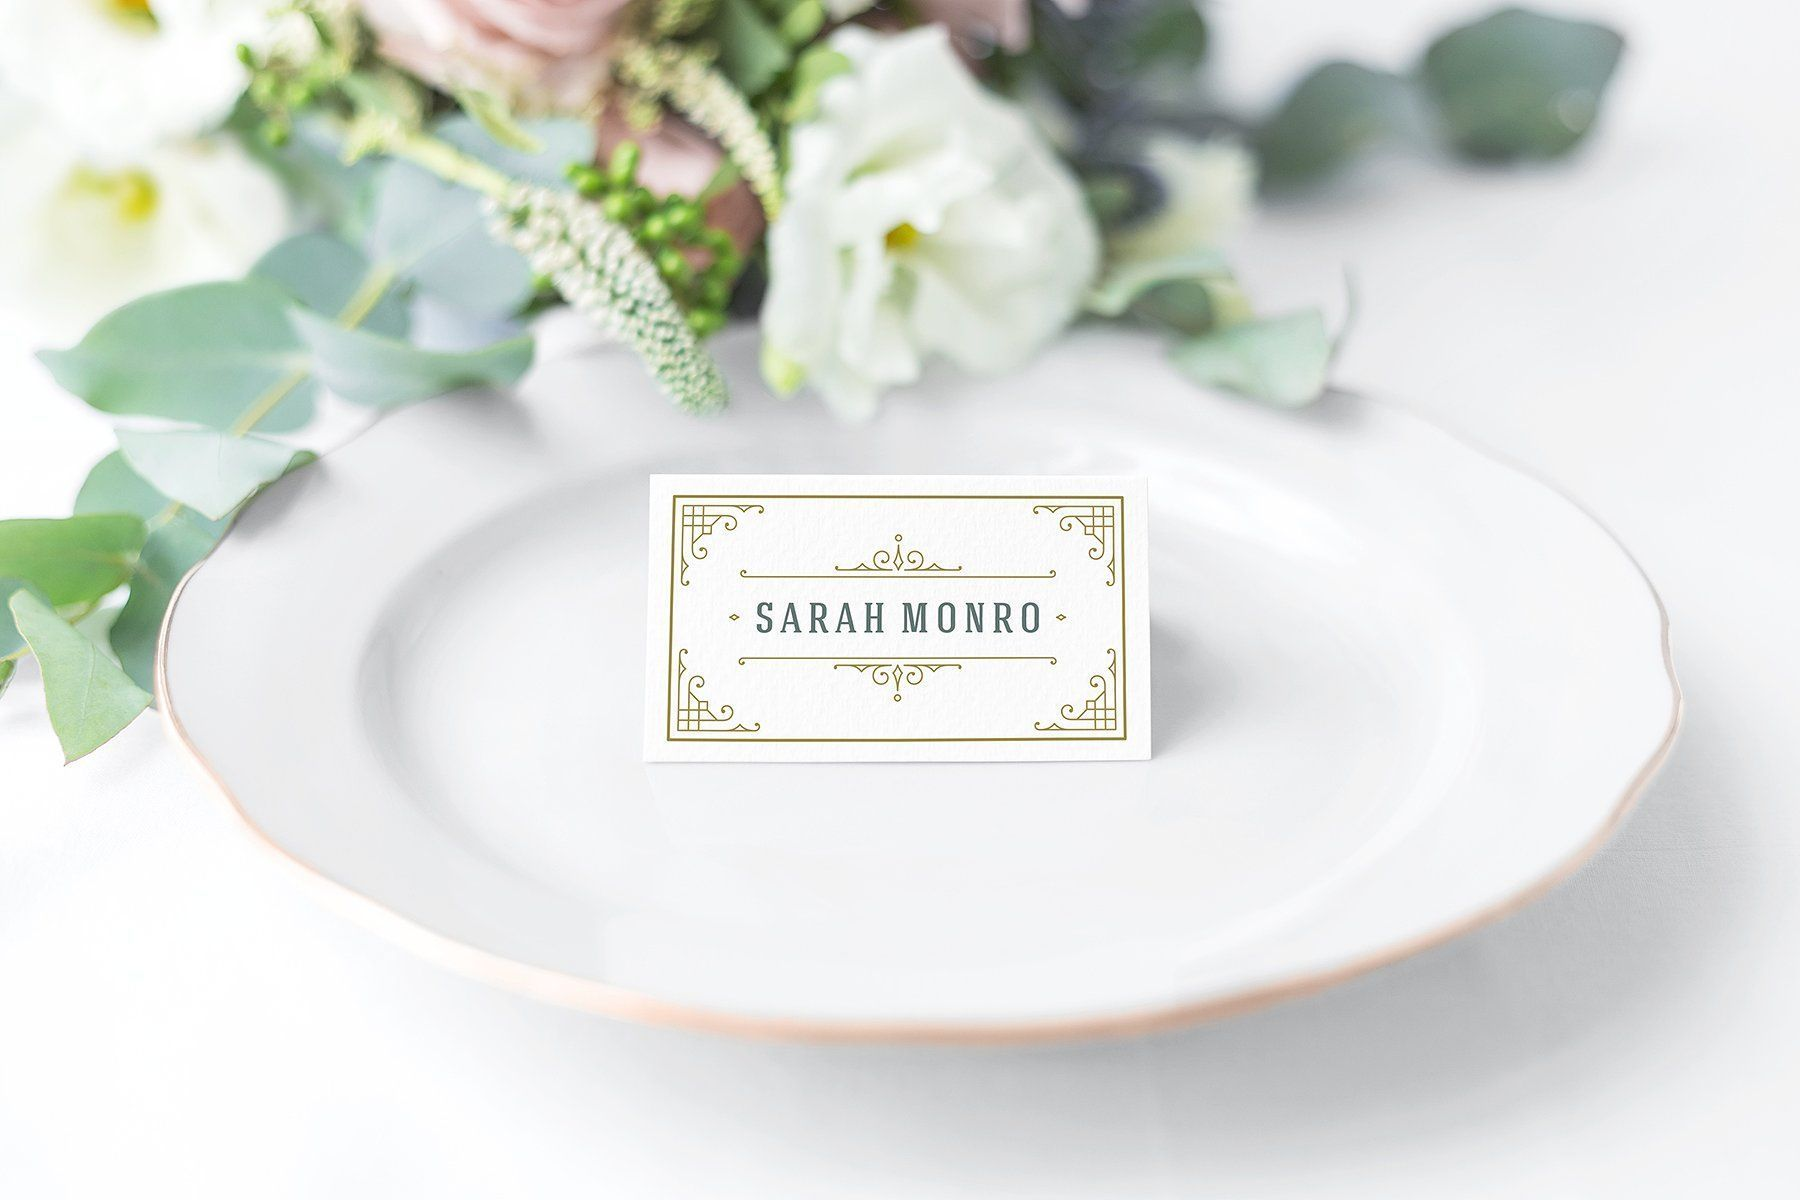 80a2c15ac8b4cc0c298b688e3368eae9: Vintage Flourish Wedding Invitations Diy At Reisefeber.org